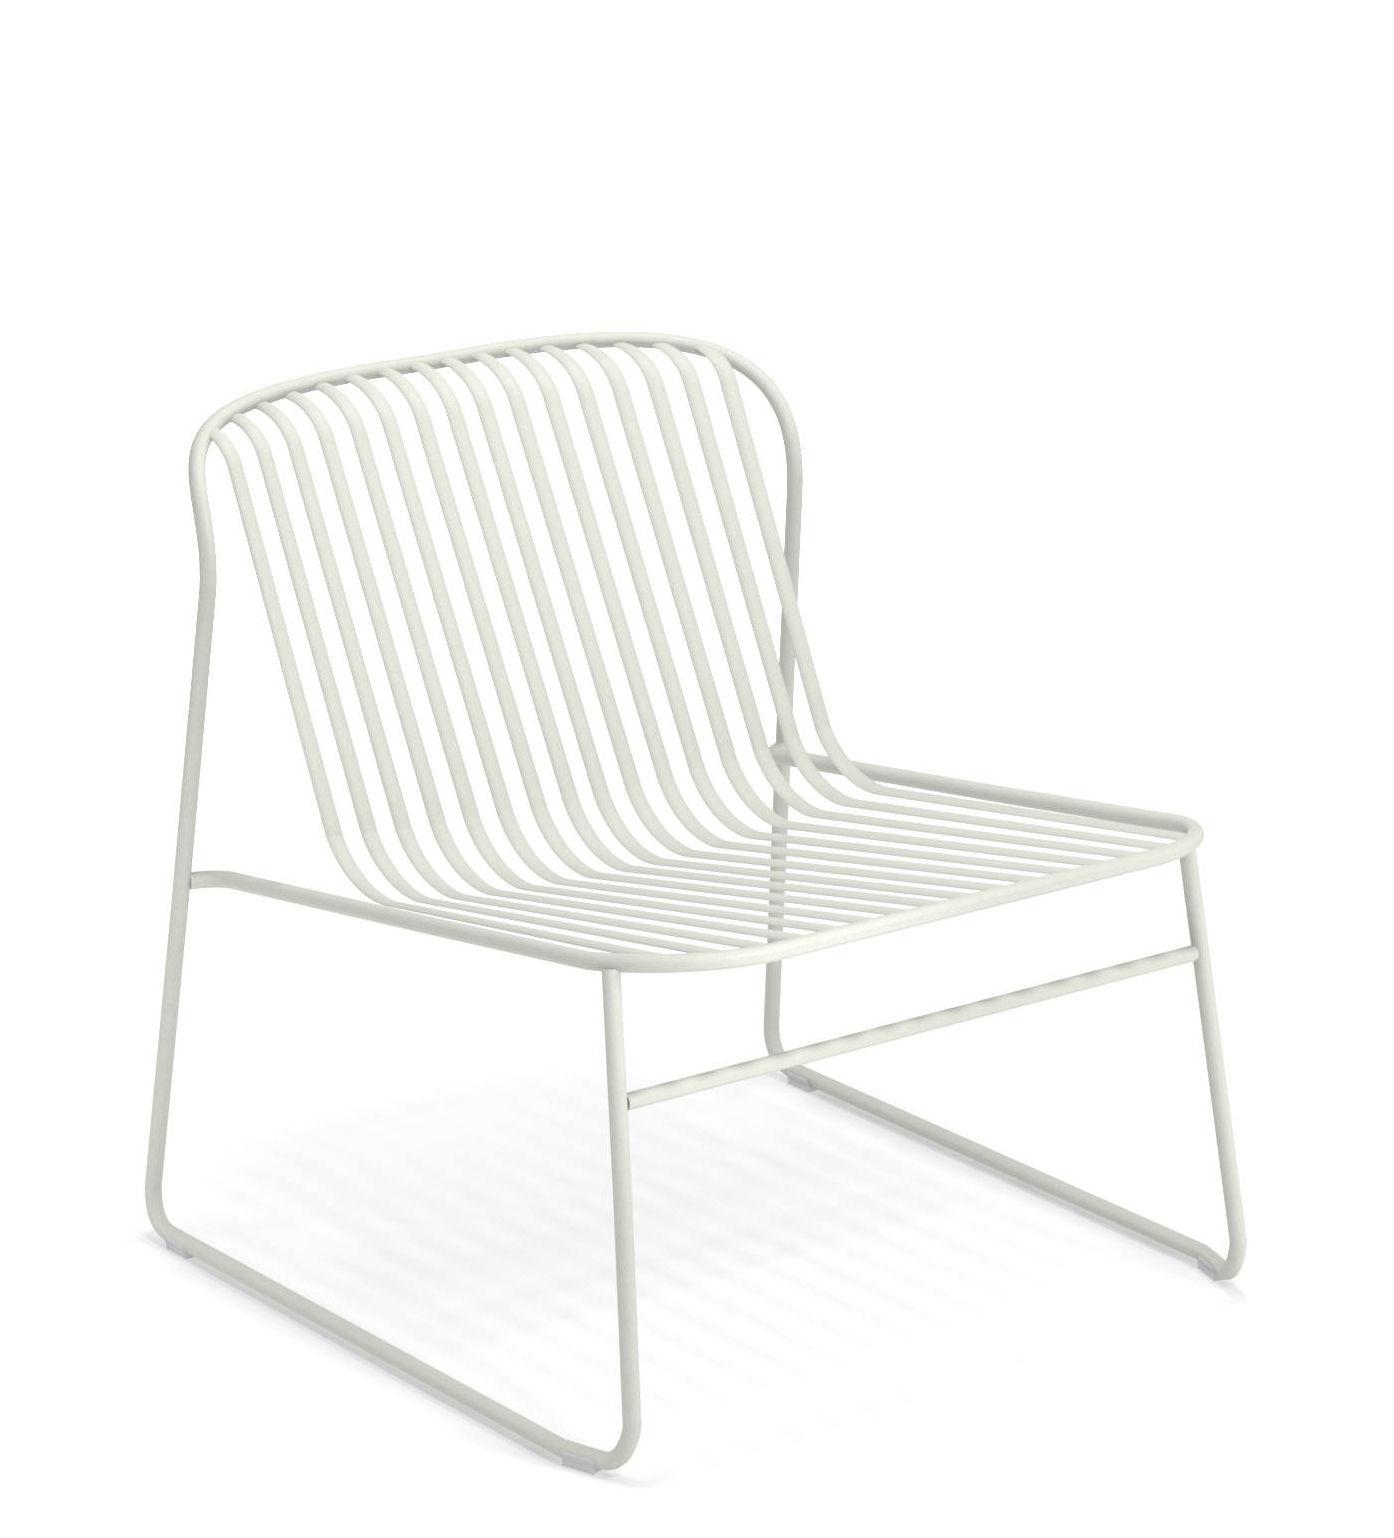 Möbel - Lounge Sessel - Riviera Lounge Sessel / Metall - Emu - Weiß - gefirnister Stahl